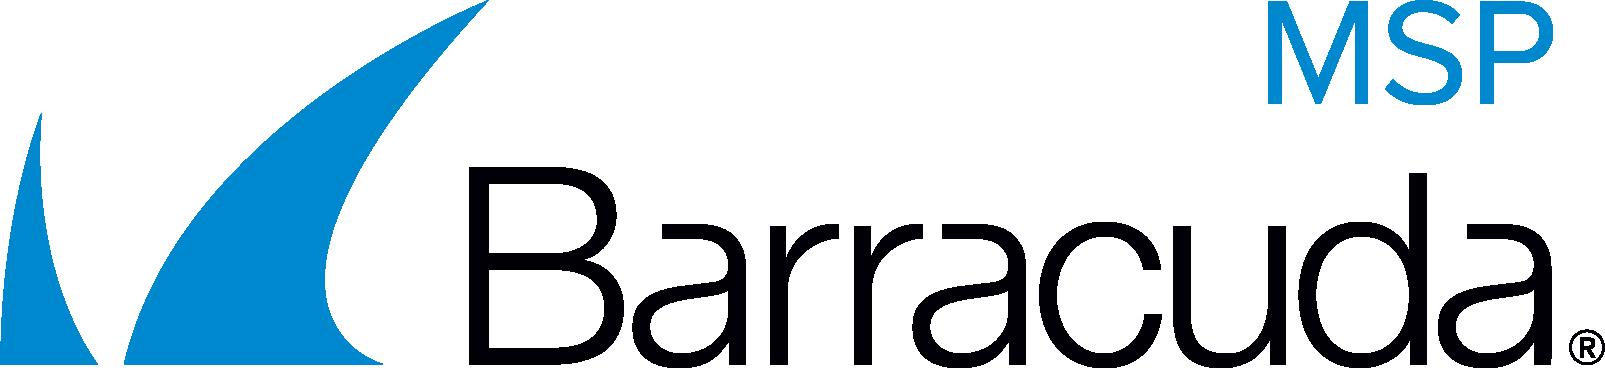 logo_barracuda-msp_LgColorCMYK